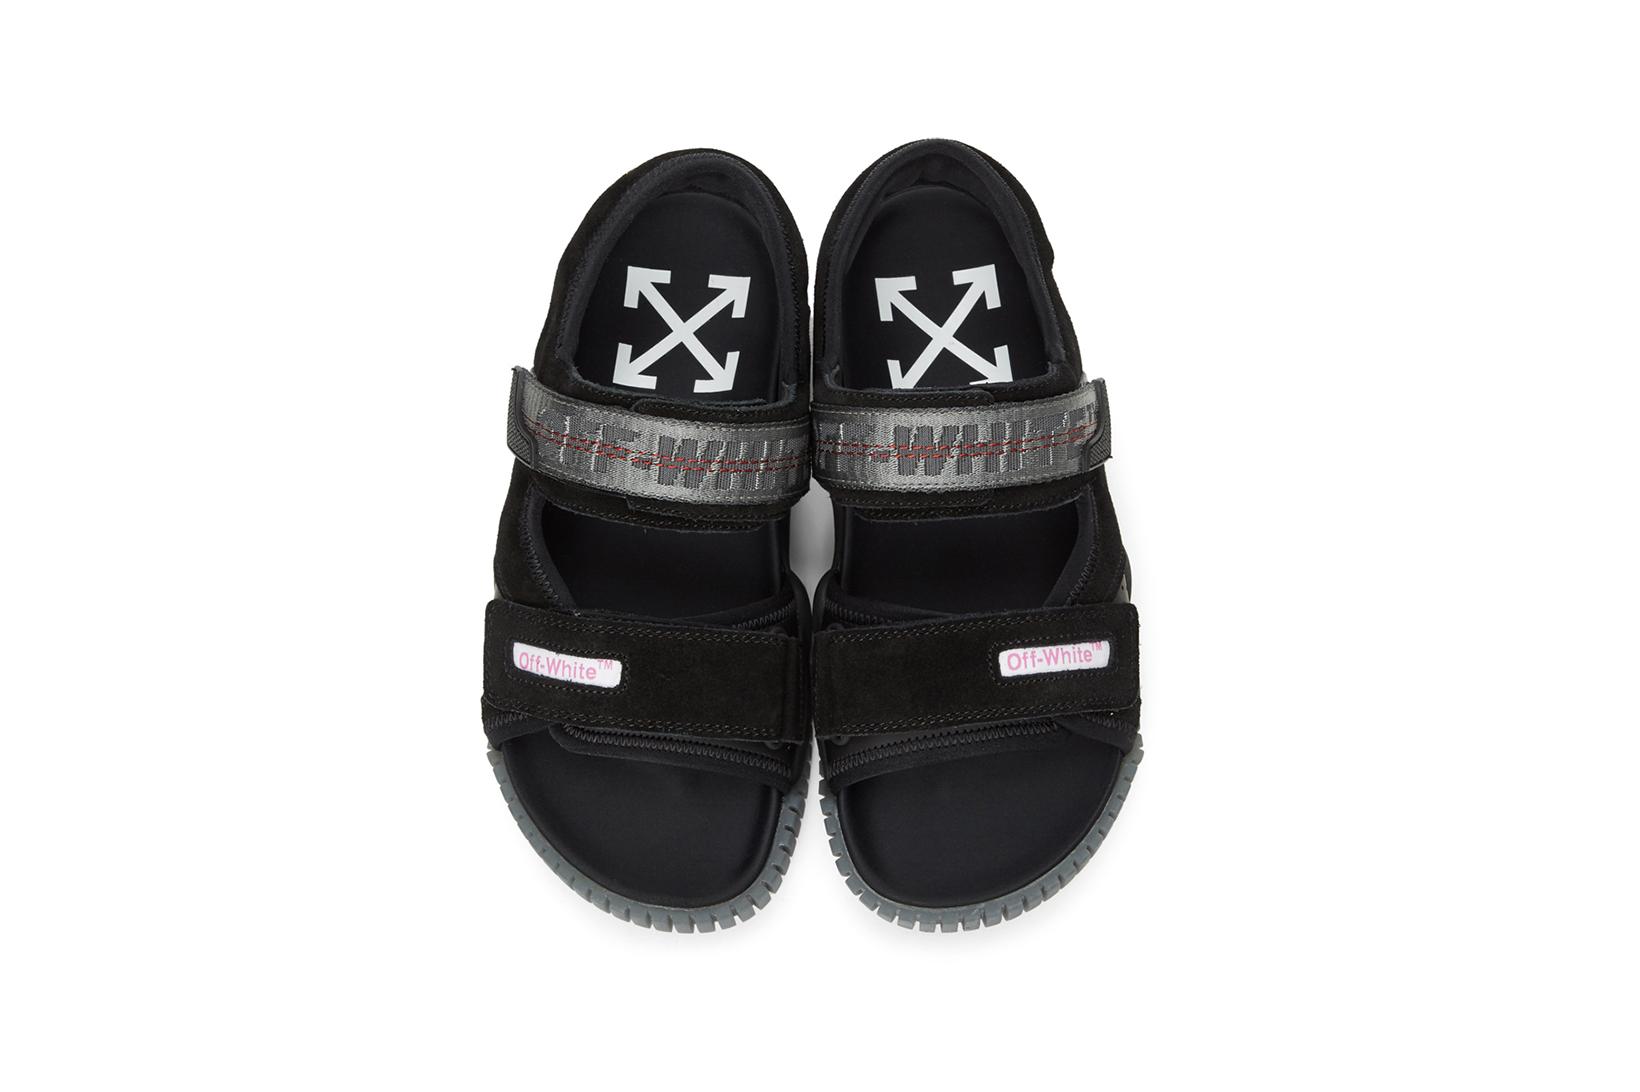 off-white-virgil-abloh-oddsy-minimal-trekking-sandals-blue-beige-black-shoes-release-9